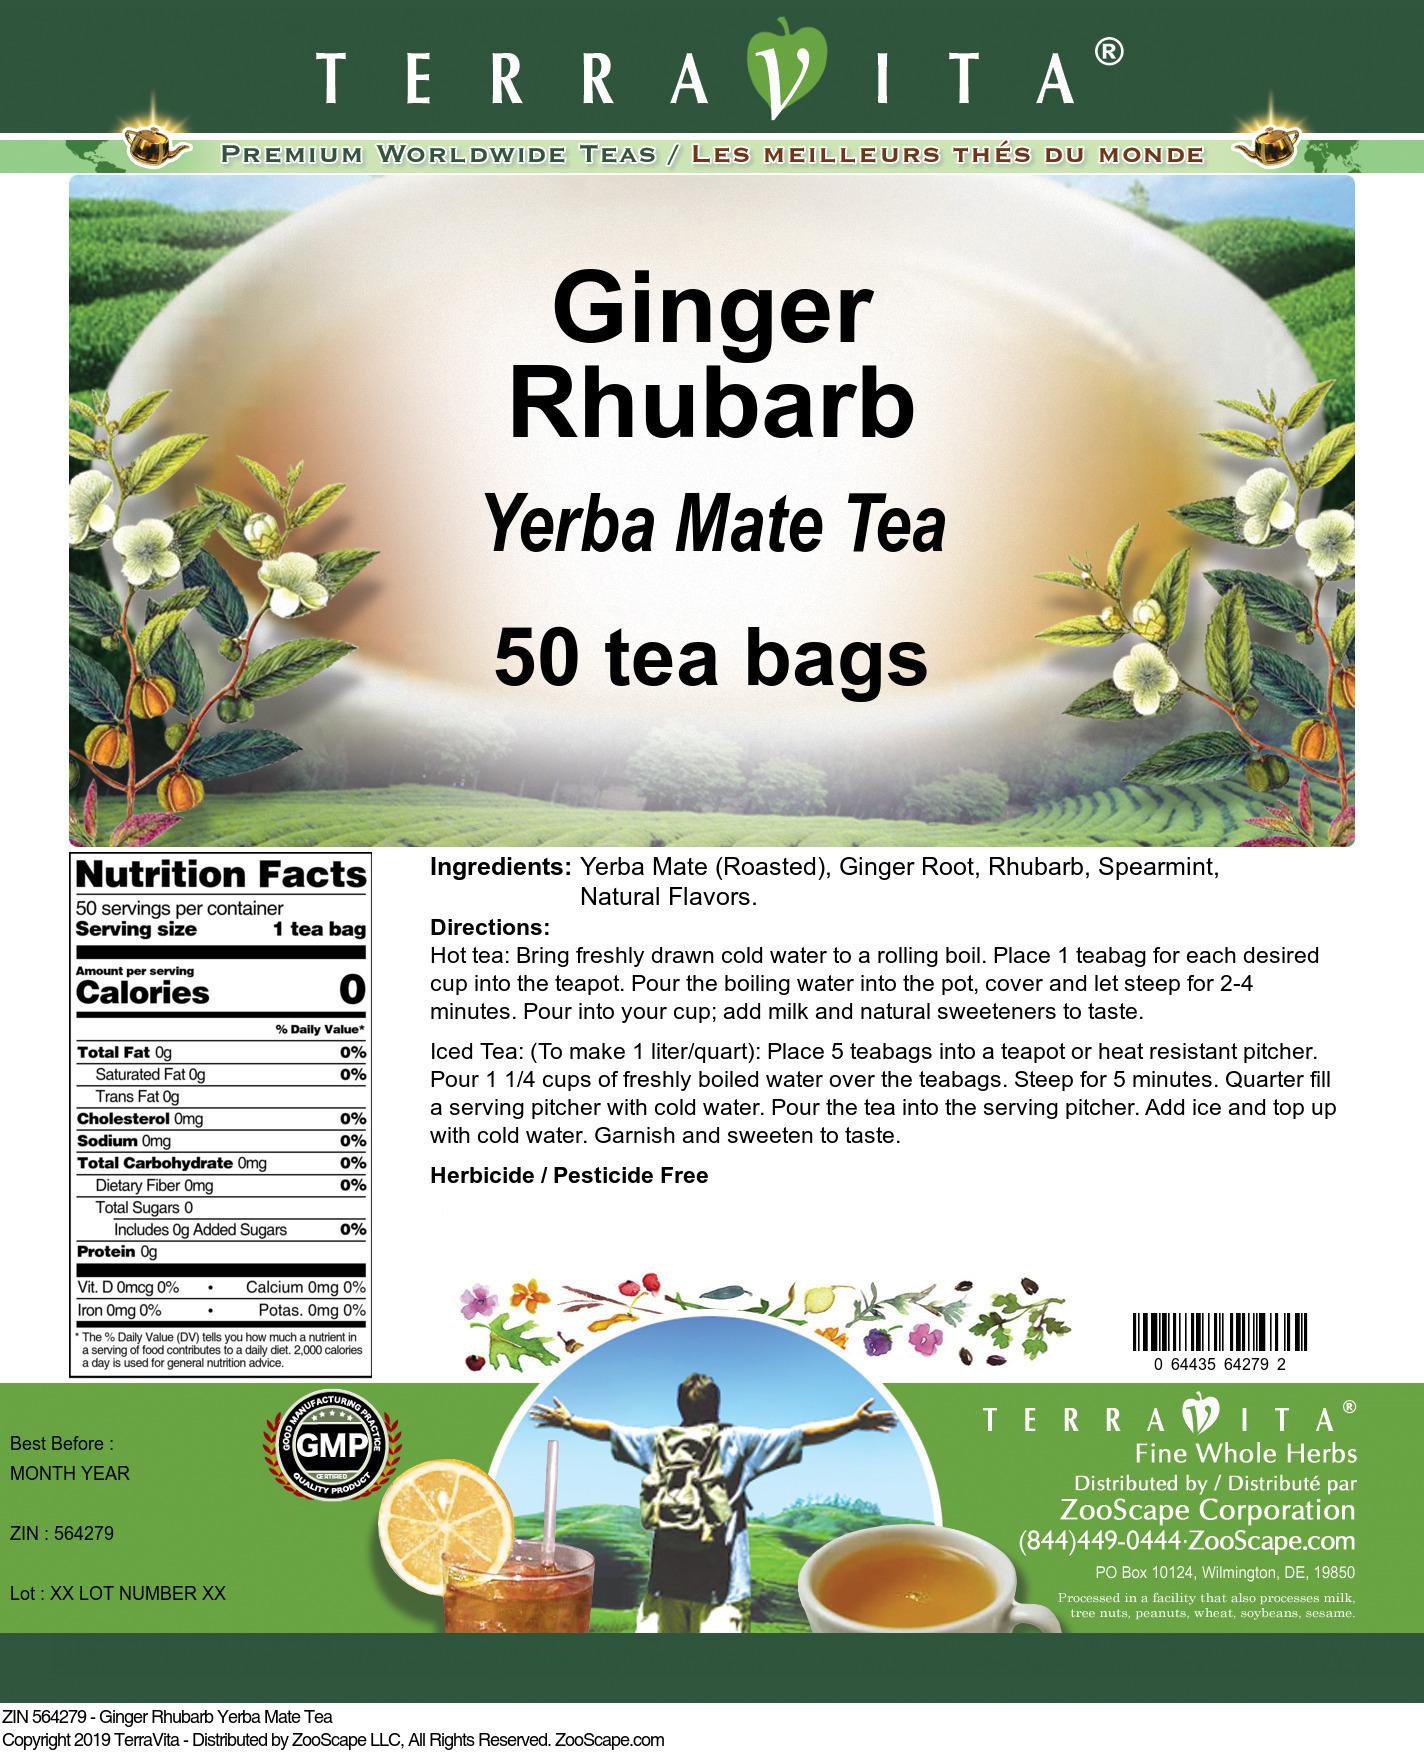 Ginger Rhubarb Yerba Mate Tea